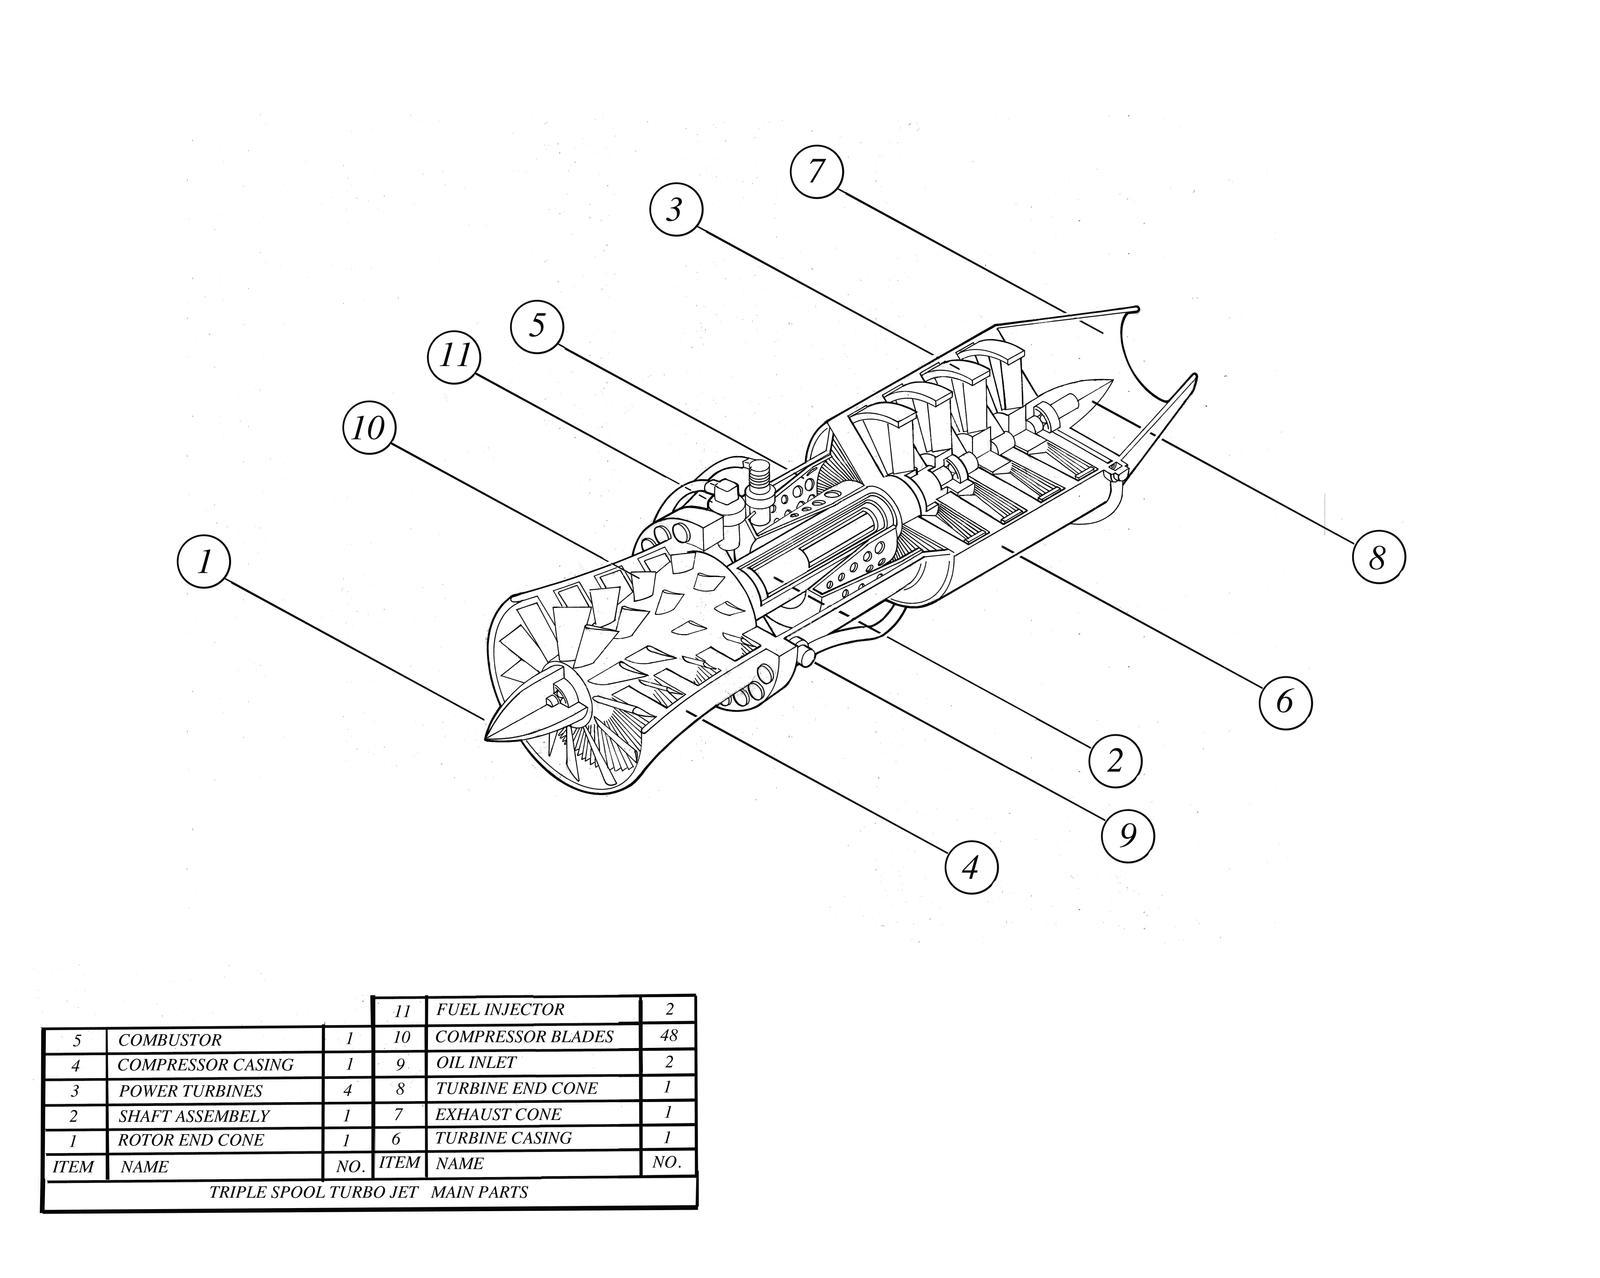 Jet engine parts by hod05 on DeviantArt